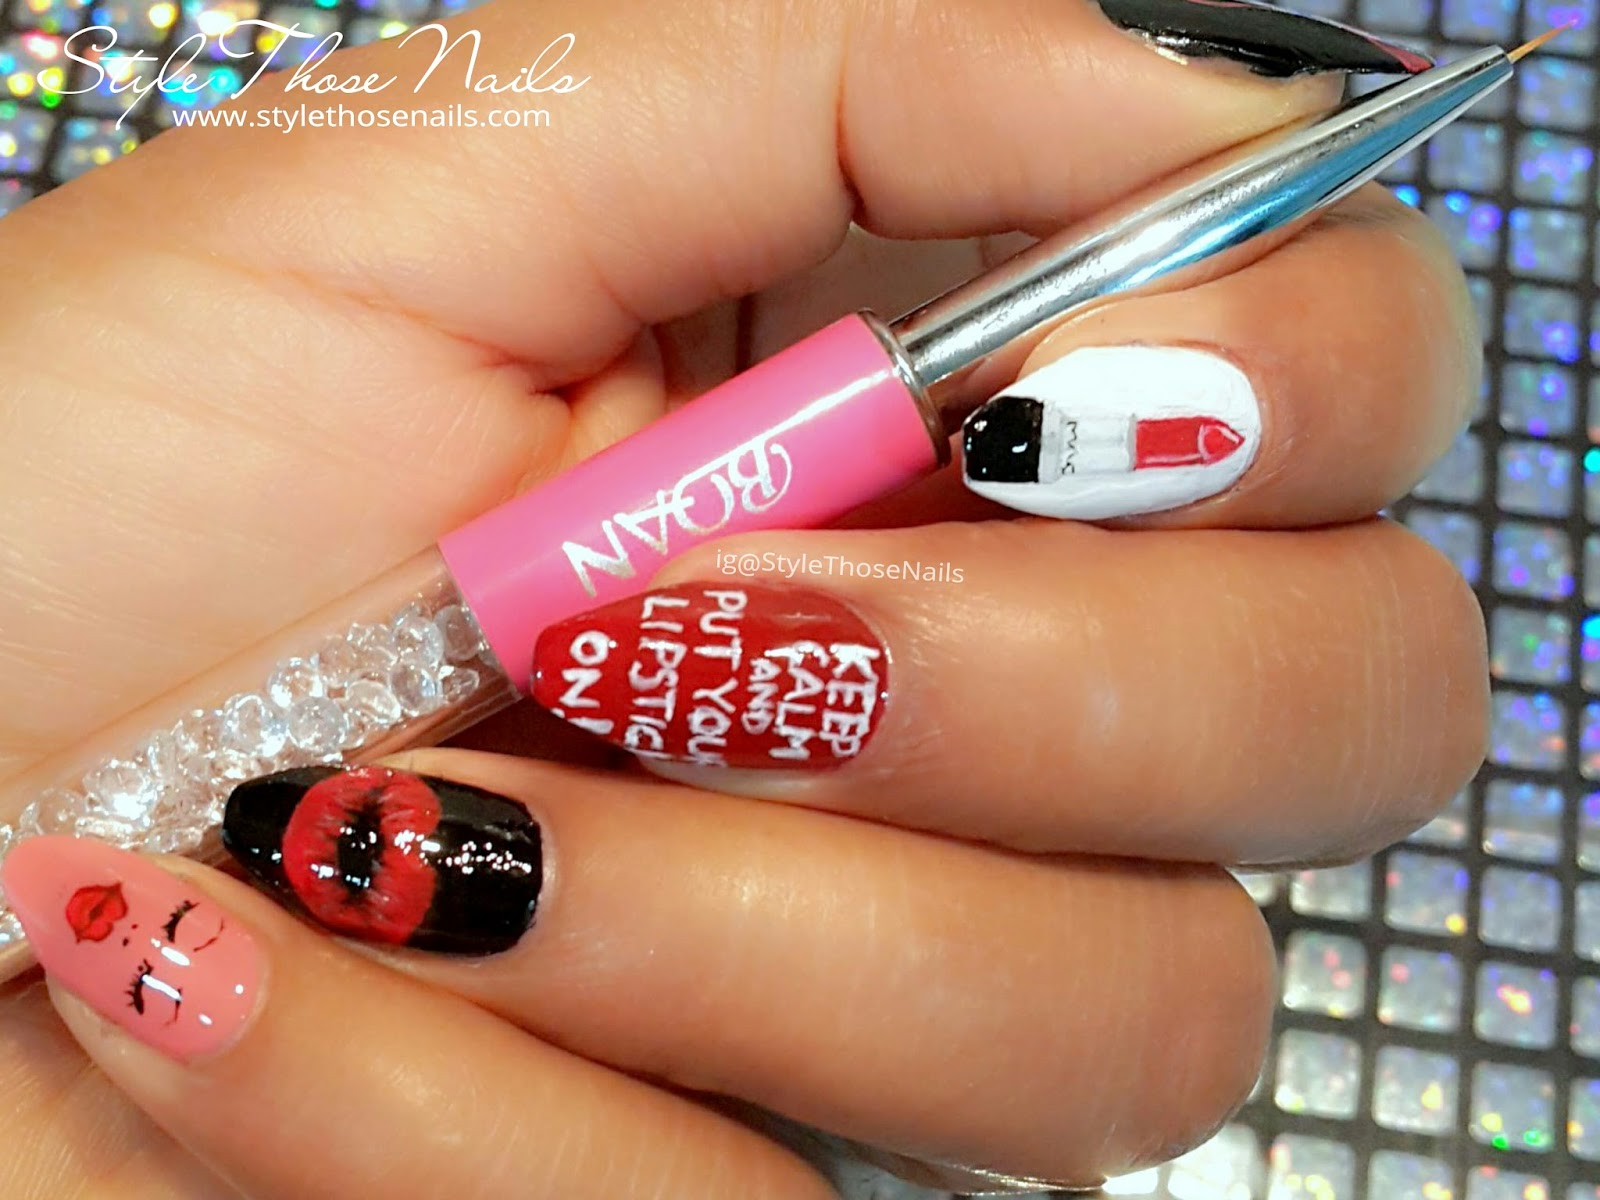 Style Those Nails Lipstick Nailart Lippie Nail Collaboration